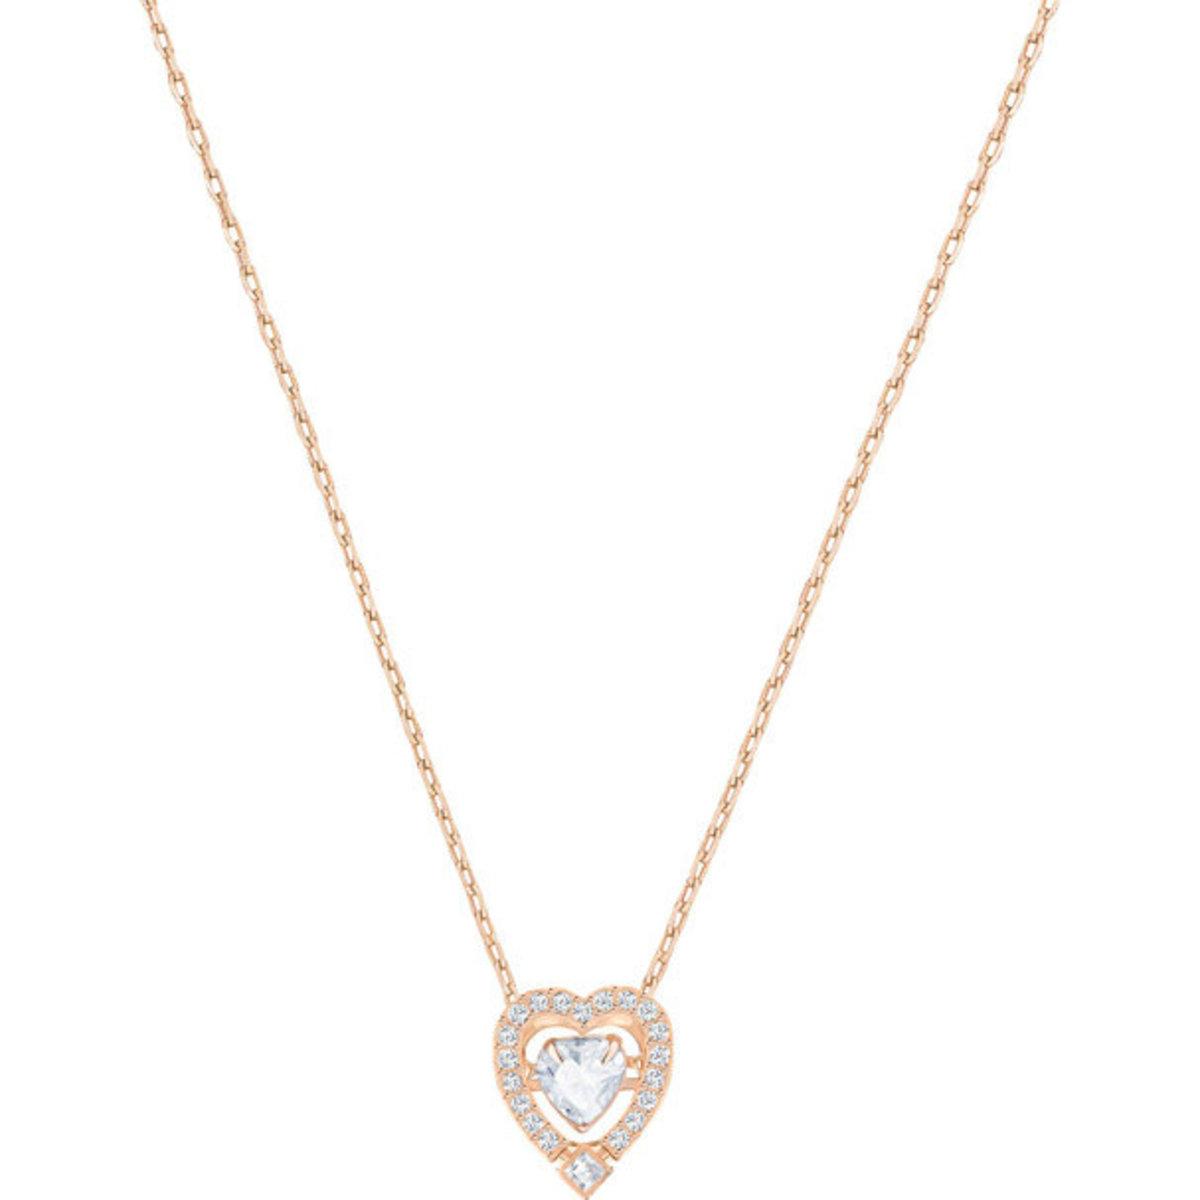 Necklaces - Sparkling Dance Heart - 5284188 (Parallel Import Goods)